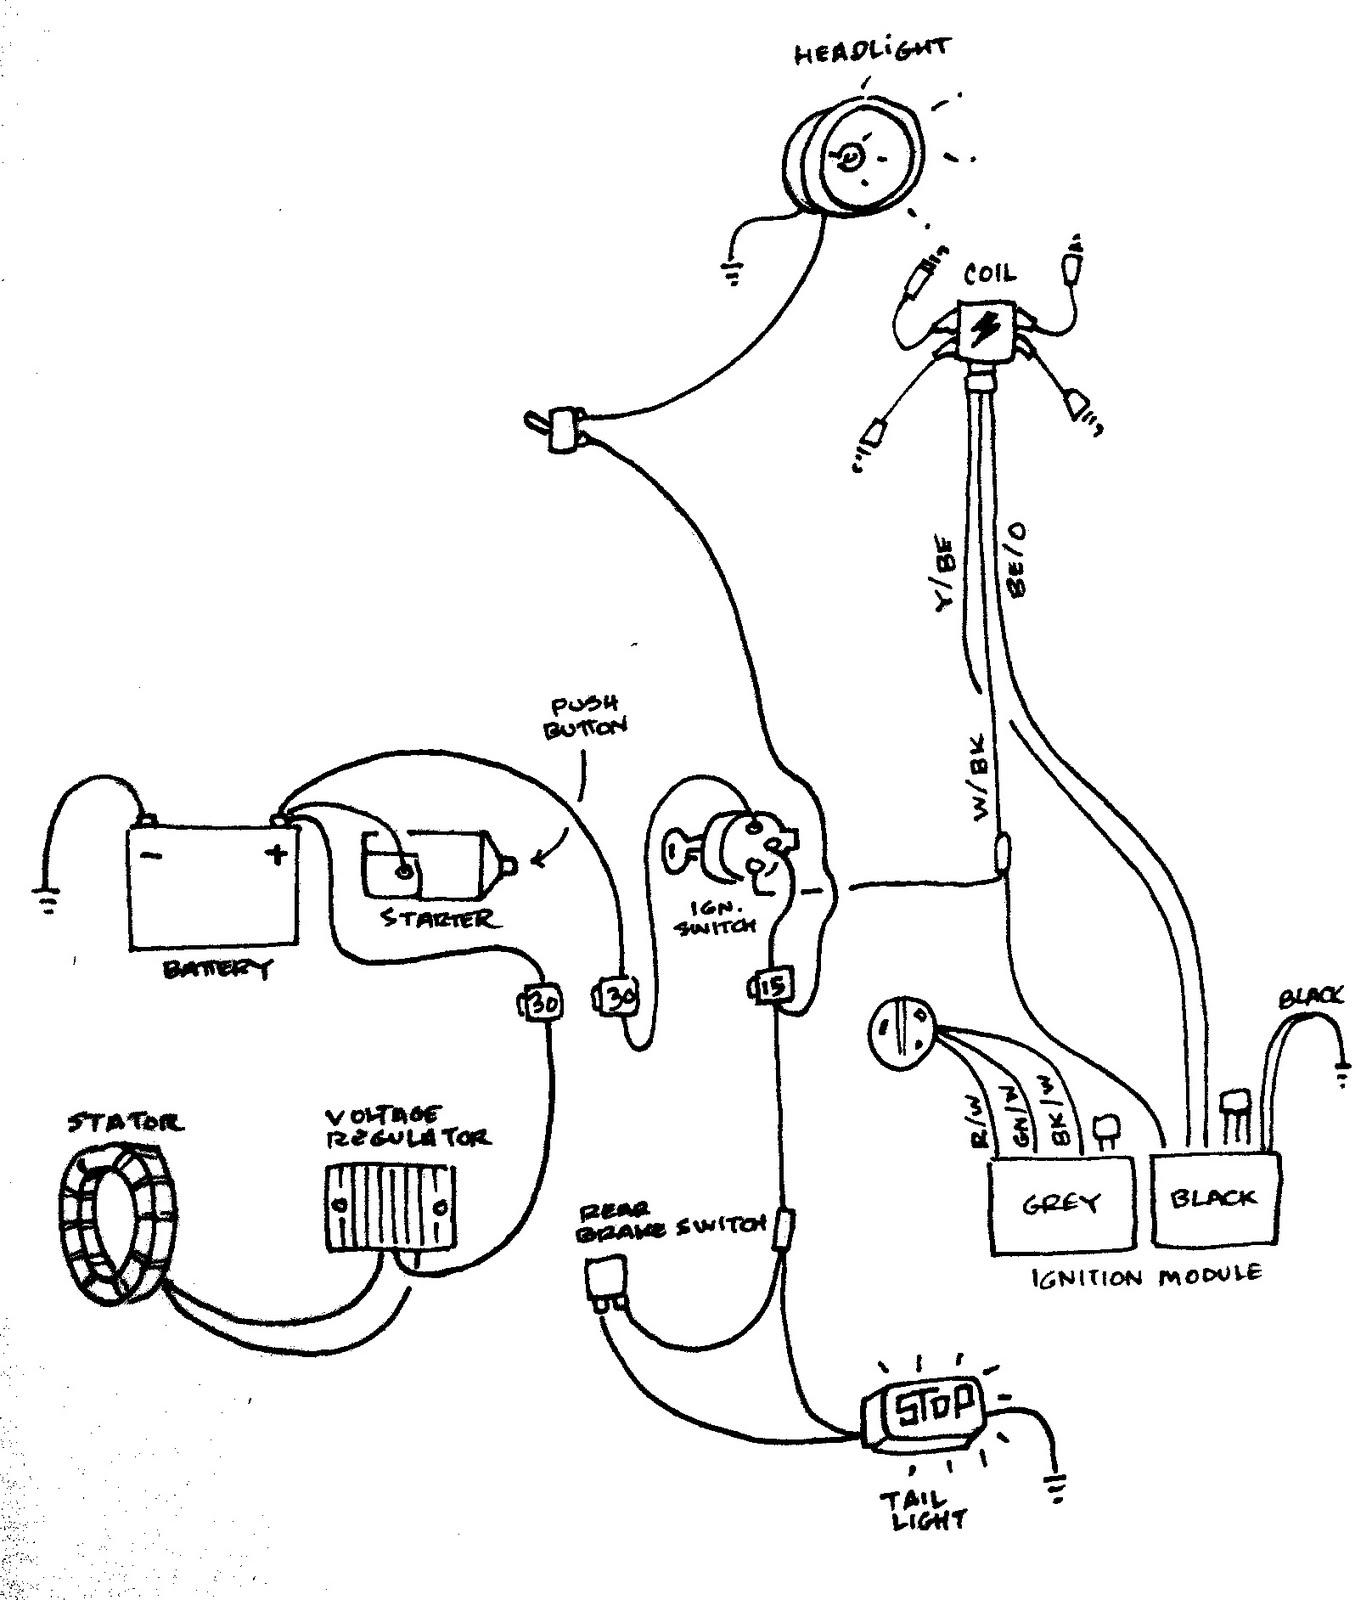 Cb750 Bobber Wiring Diagram Somurich Com Cb550 Wiring Diagram Cb750 Bobber  Wiring Diagram